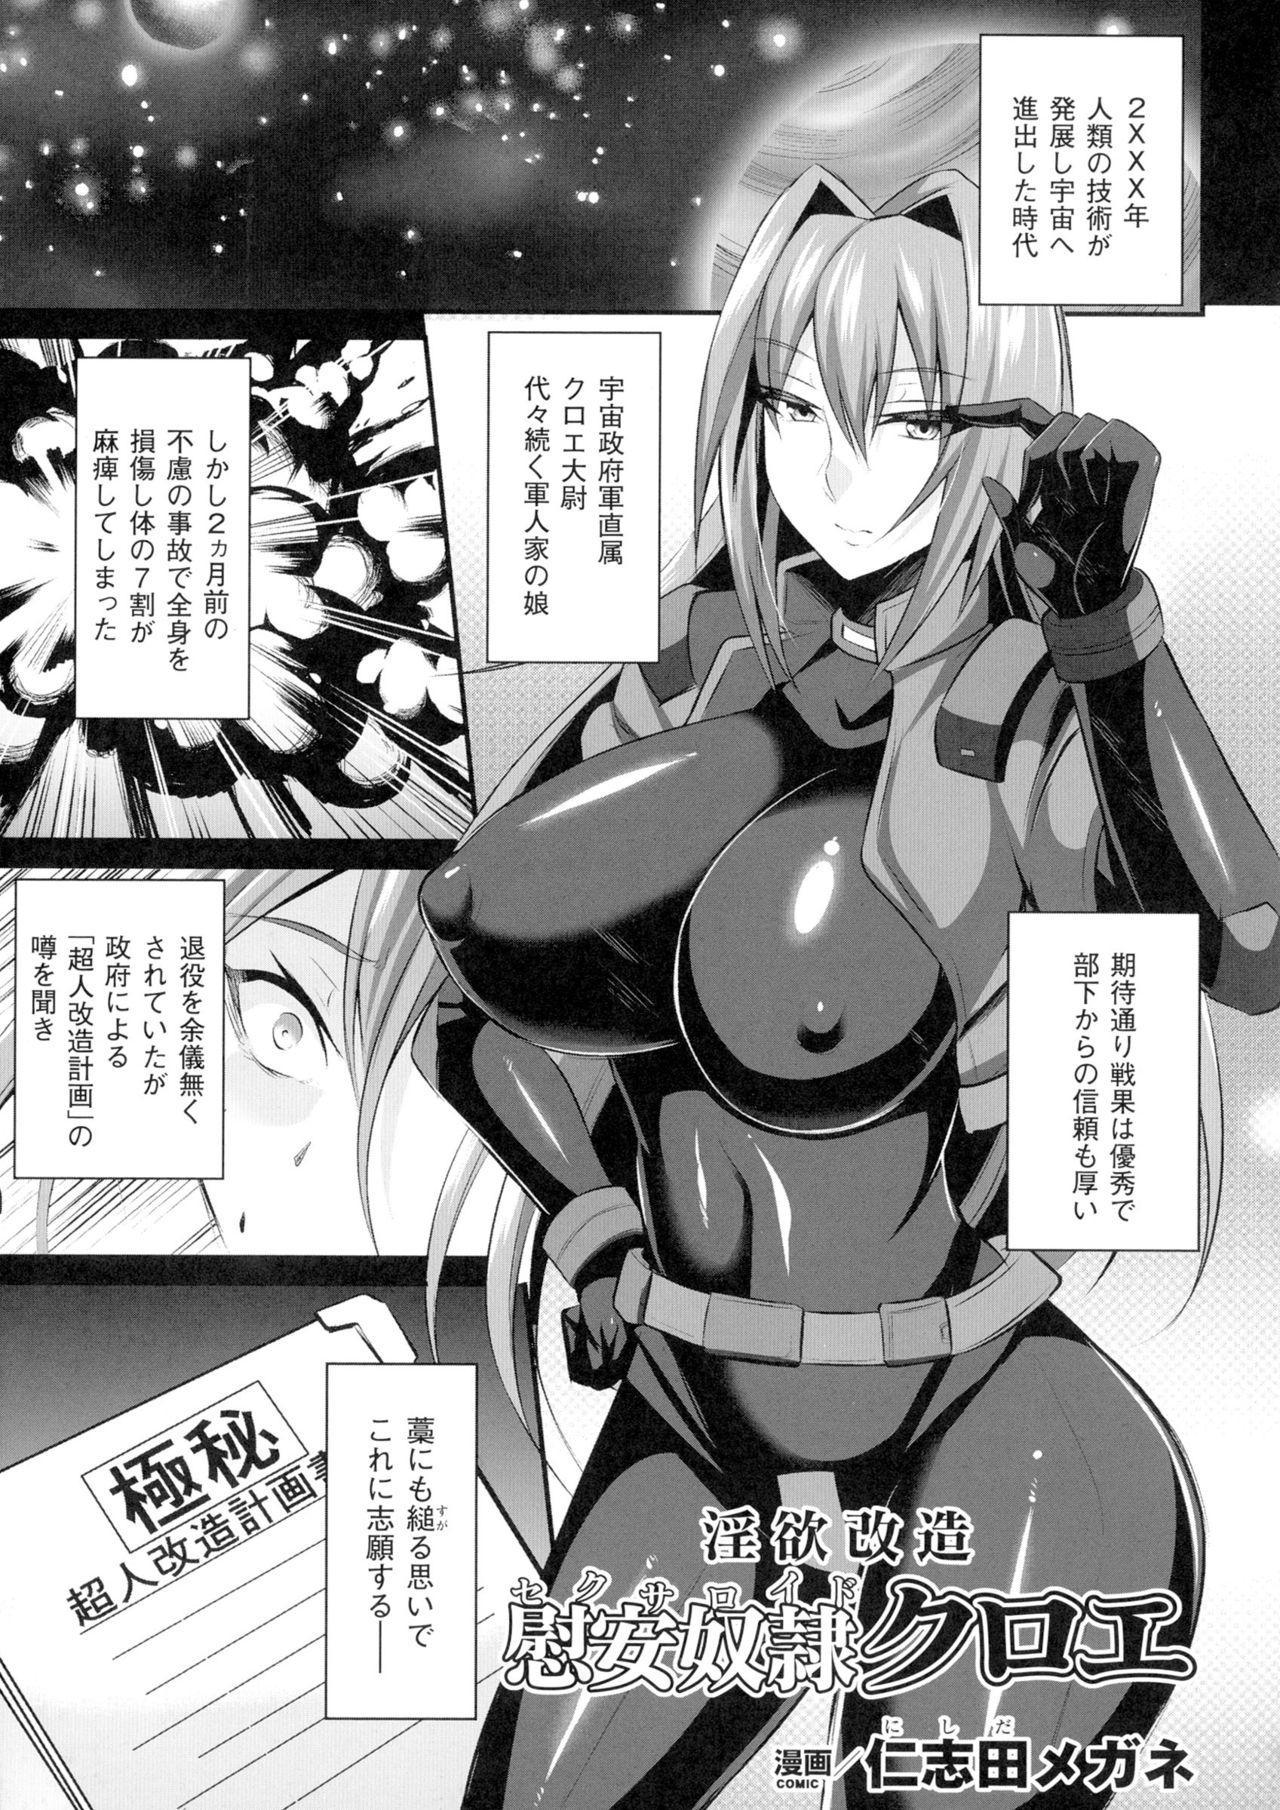 Seigi no Heroine Kangoku File DX Vol. 1 146